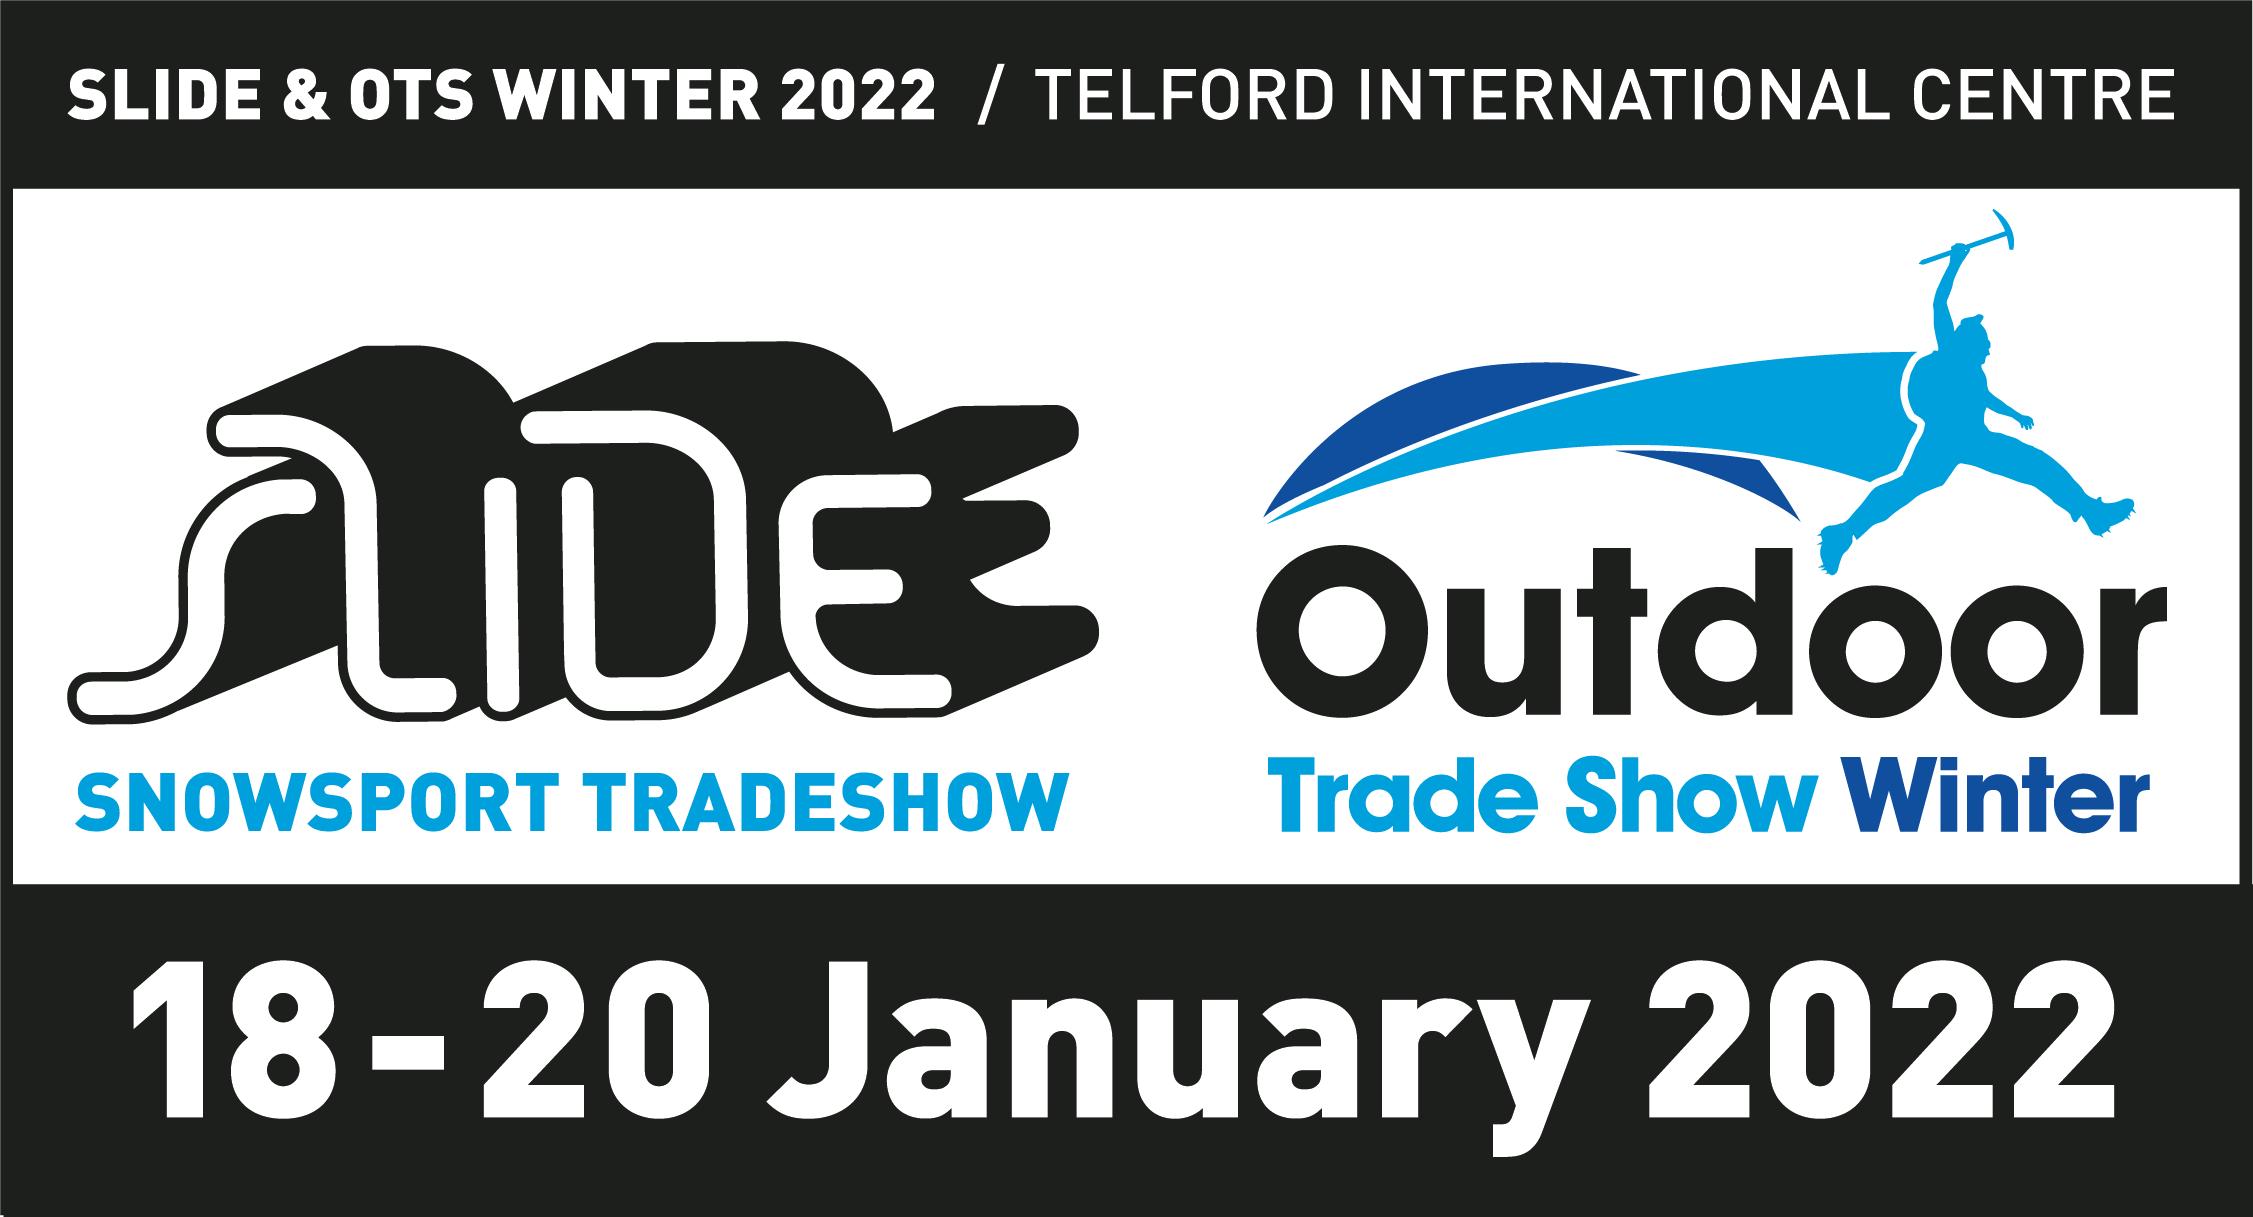 Great Launch For Slide & OTS Winter